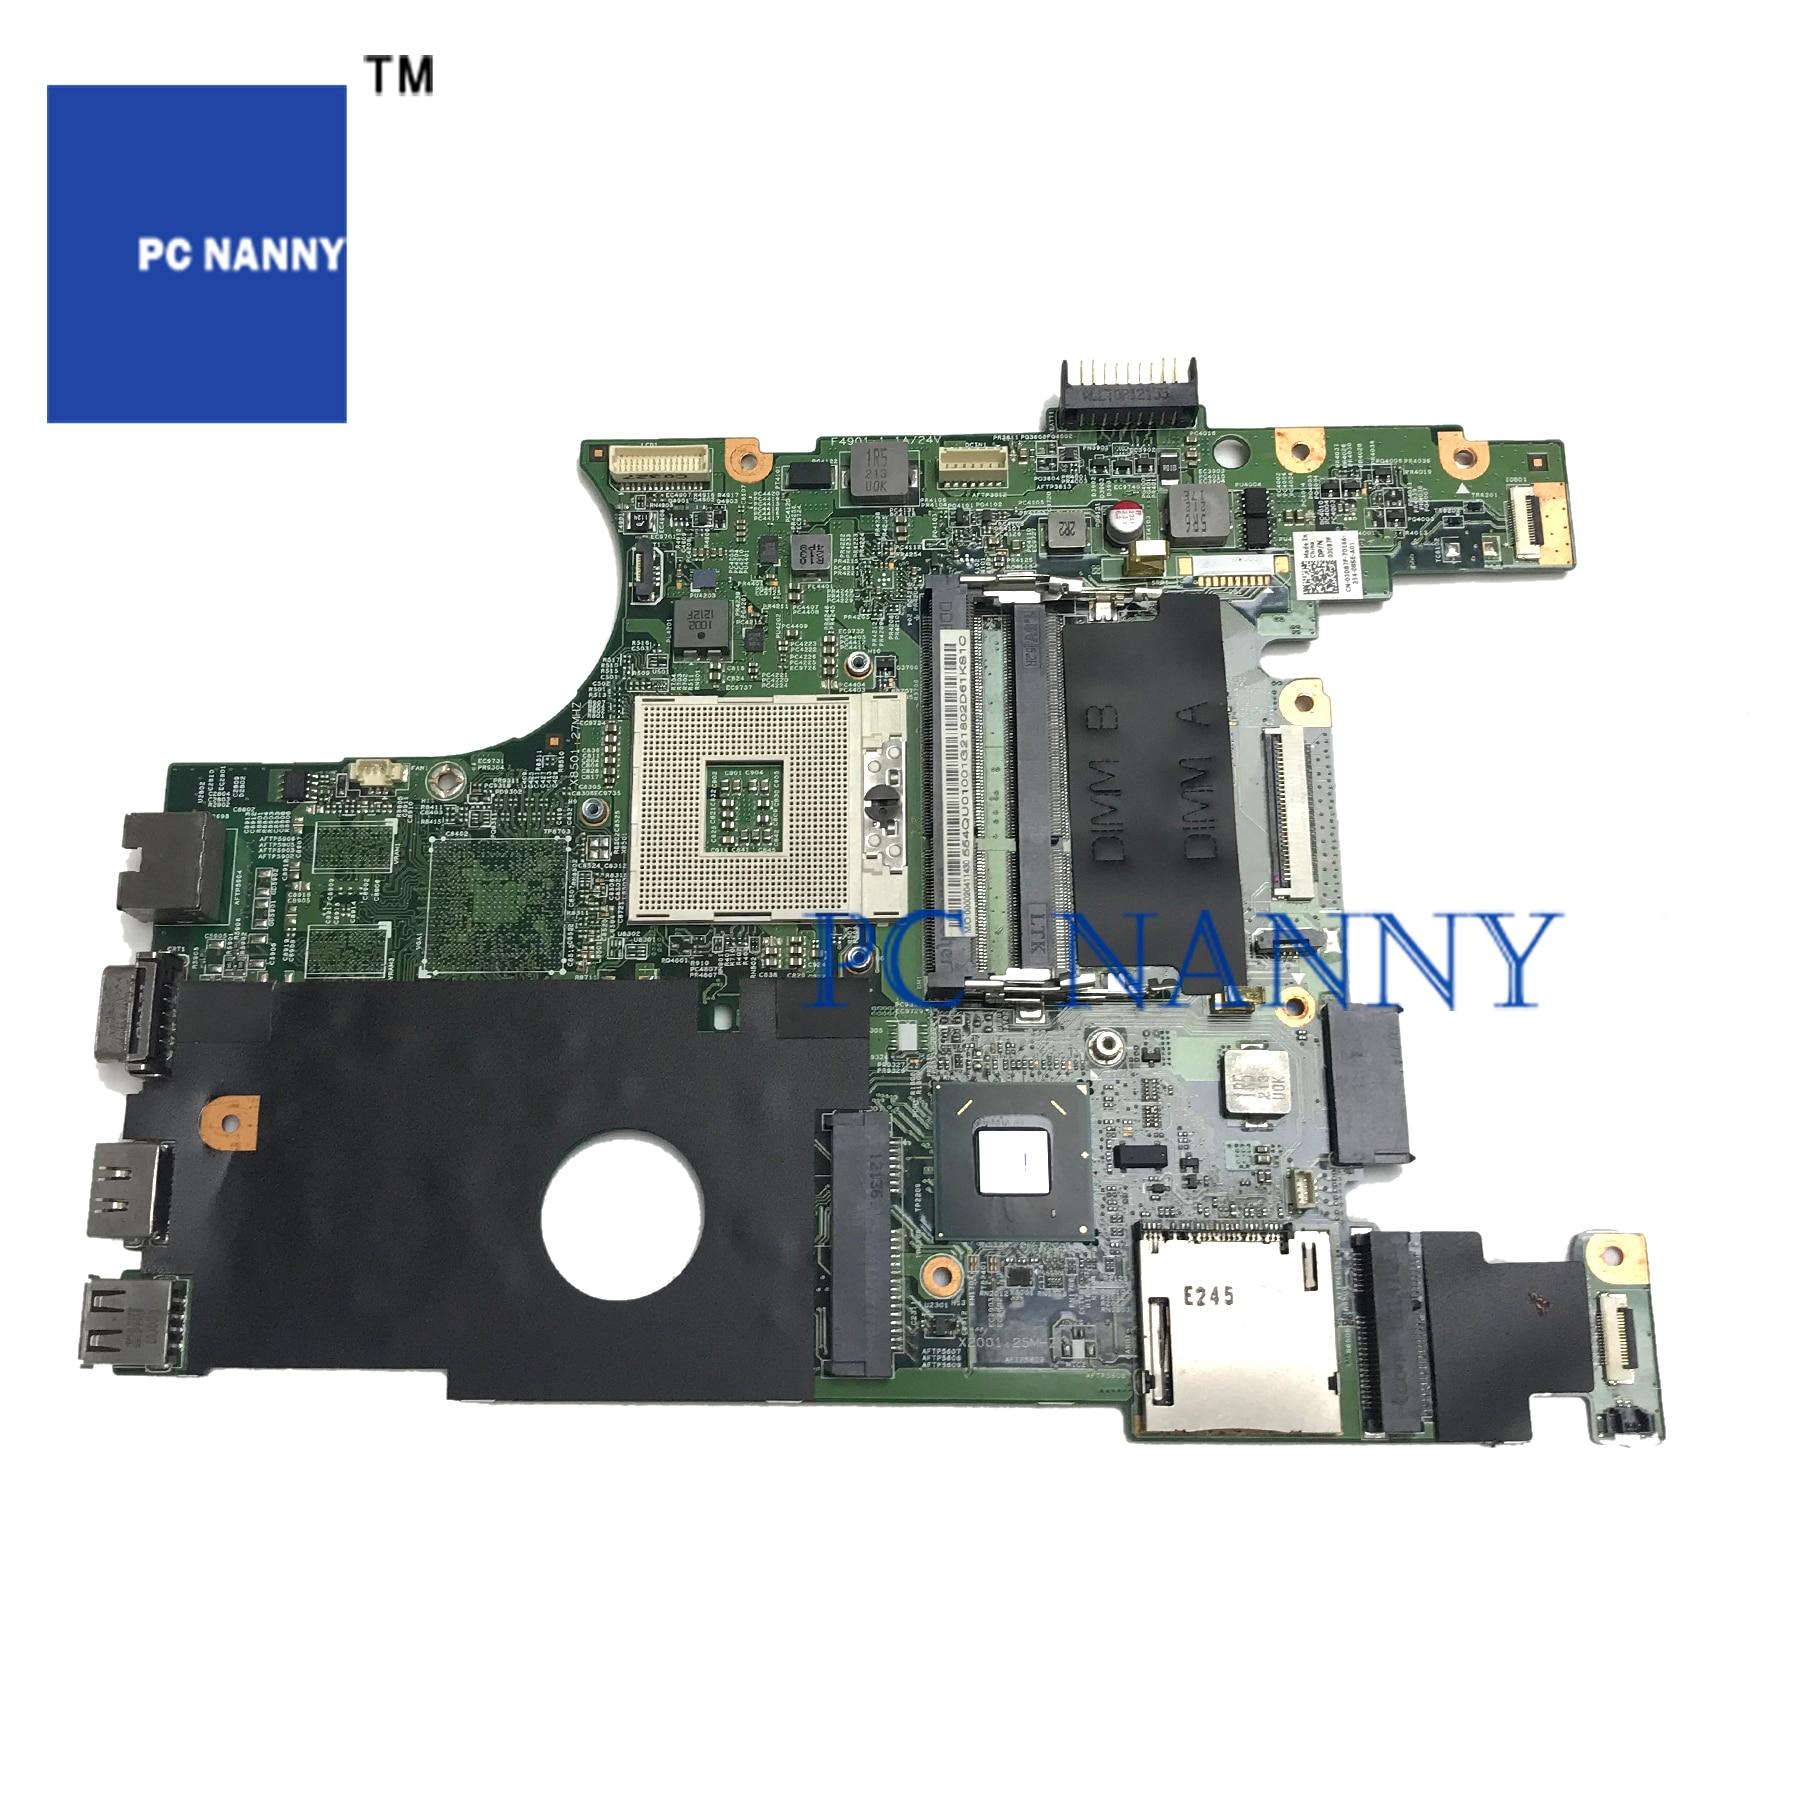 PC NANNY FÜR DELL INSPIRON N4050 laptop motherboard 03D87F 3D87F HM65 DDR3 getestet